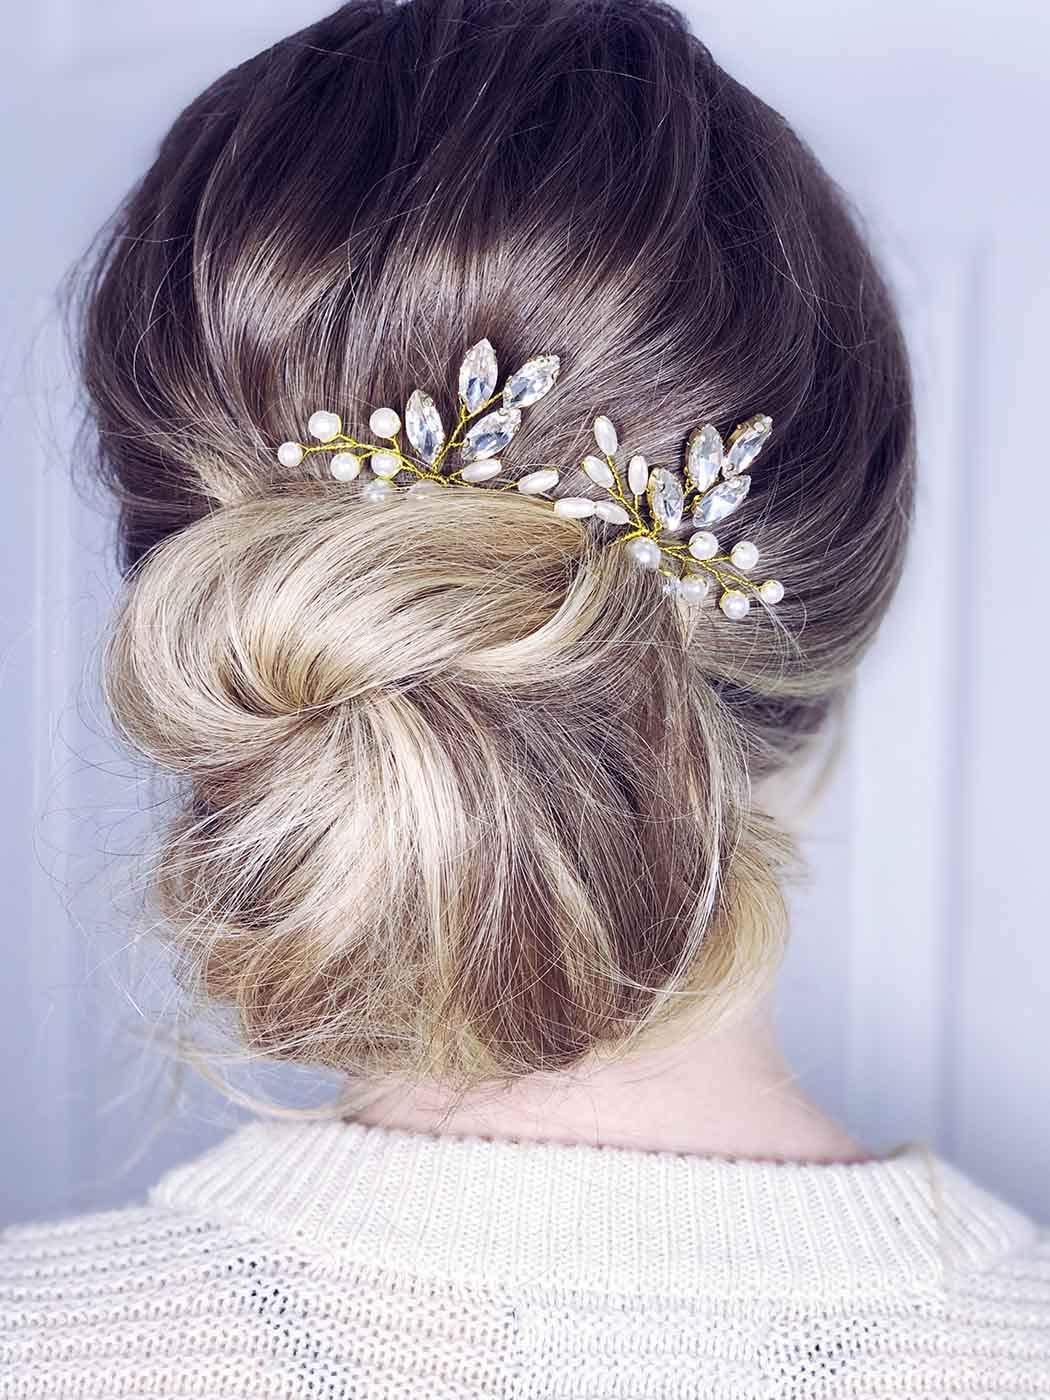 Asooll Gold Wedding Pearl Headpiece Bride Crystal Hair Pins headband Bridal Hair Accessories for Women and Girls 2Pcs